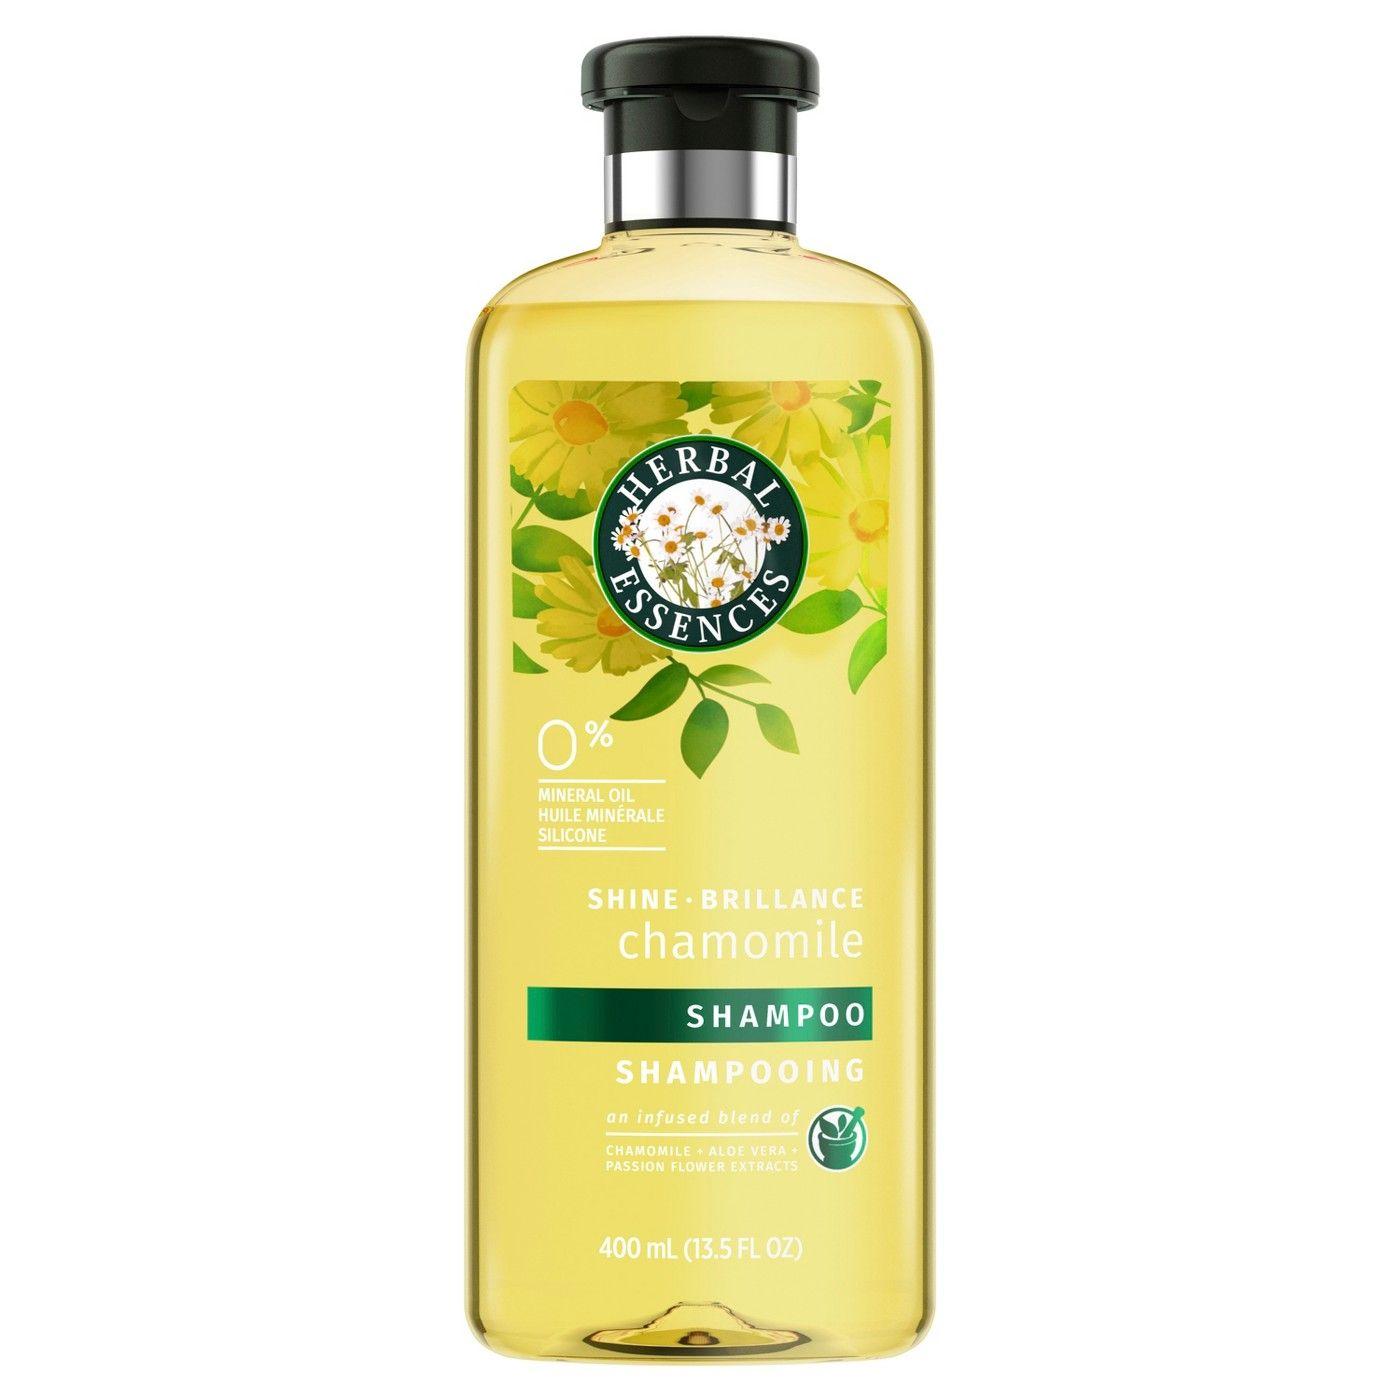 Herbal Essences Shine Collection Shampoo 13 5 Fl Oz Herbal Essences Herbal Essence Shampoo Shampoo